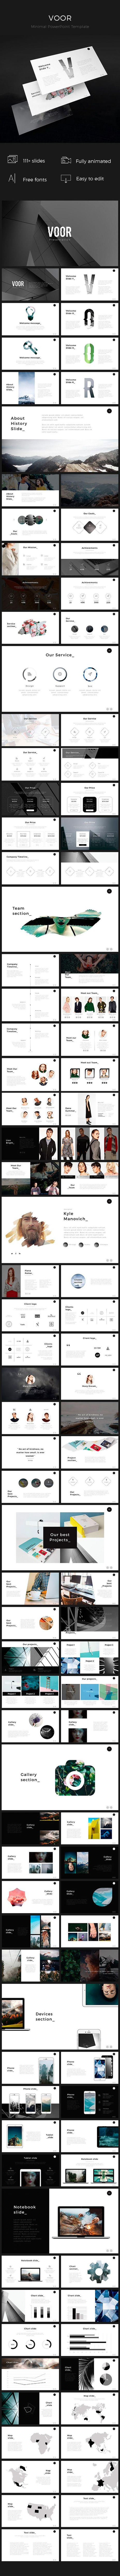 Clean & Trend Voor PowerPoint Template  #design #gallery • Download ➝ https://graphicriver.net/item/clean-trend-voor-powerpoint-template/18661779?ref=pxcr